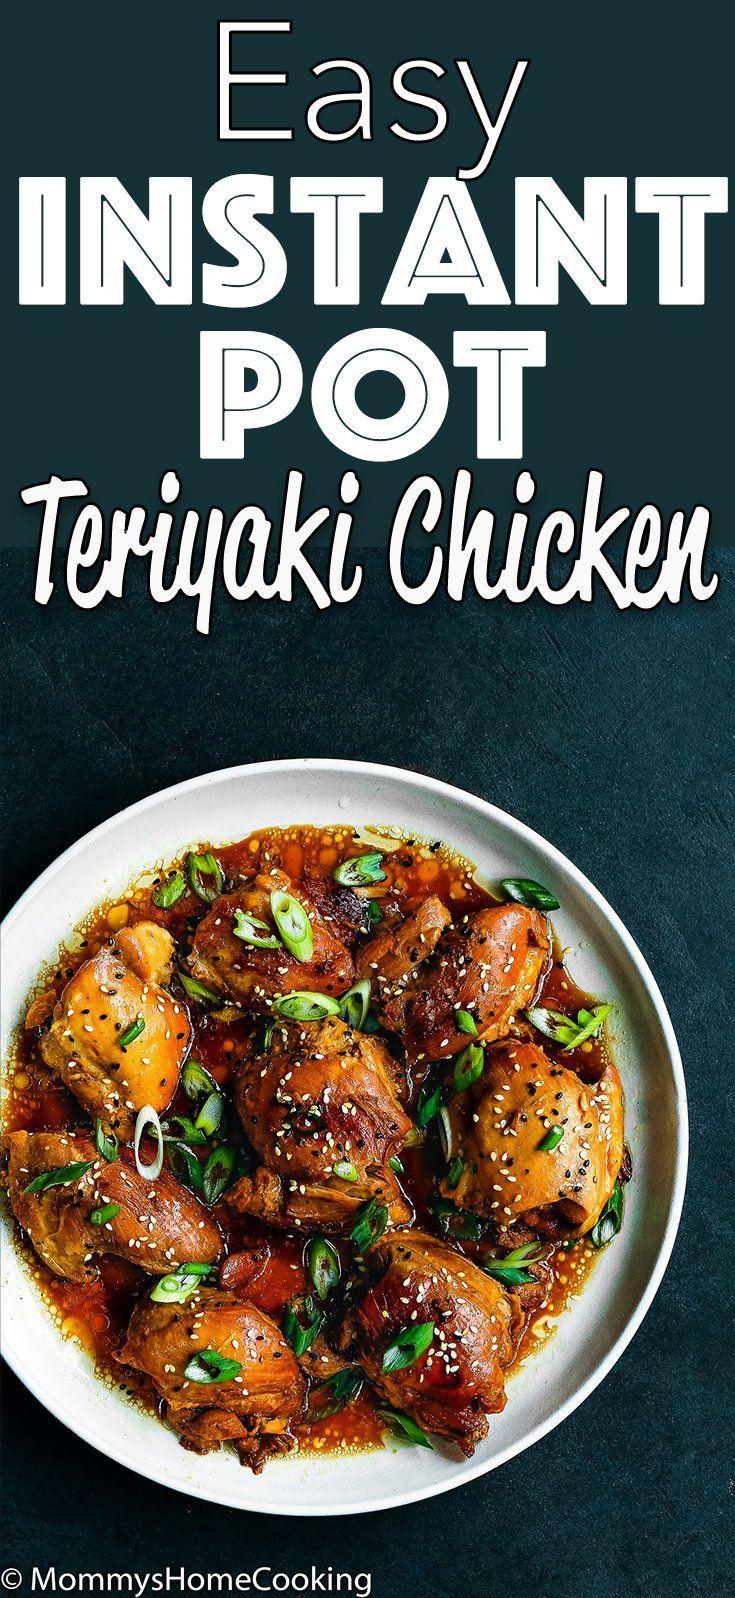 Easy Instant Pot Teriyaki Chicken Recipe #instantpotchickenrecipes